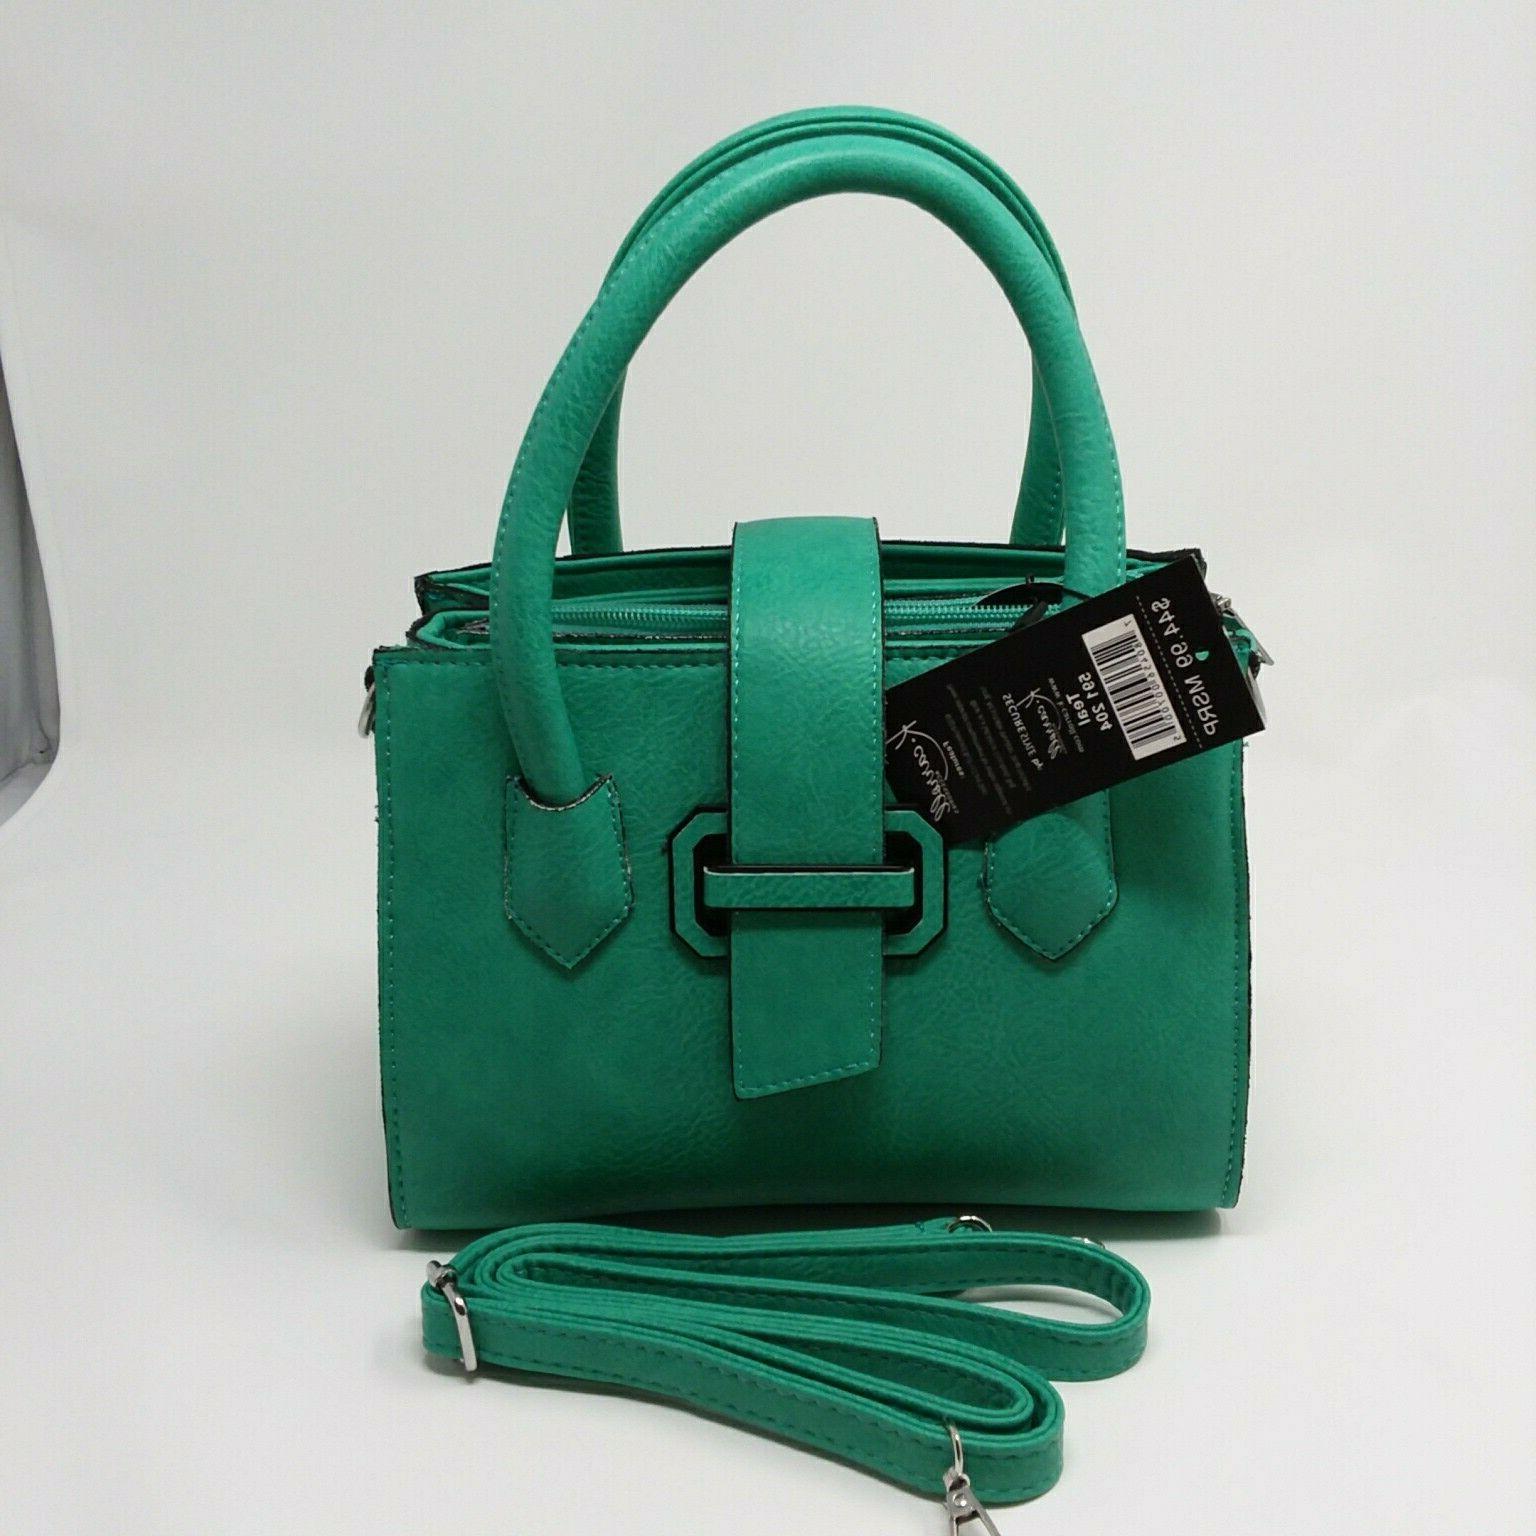 k carroll accessories audrey satchel purse teal